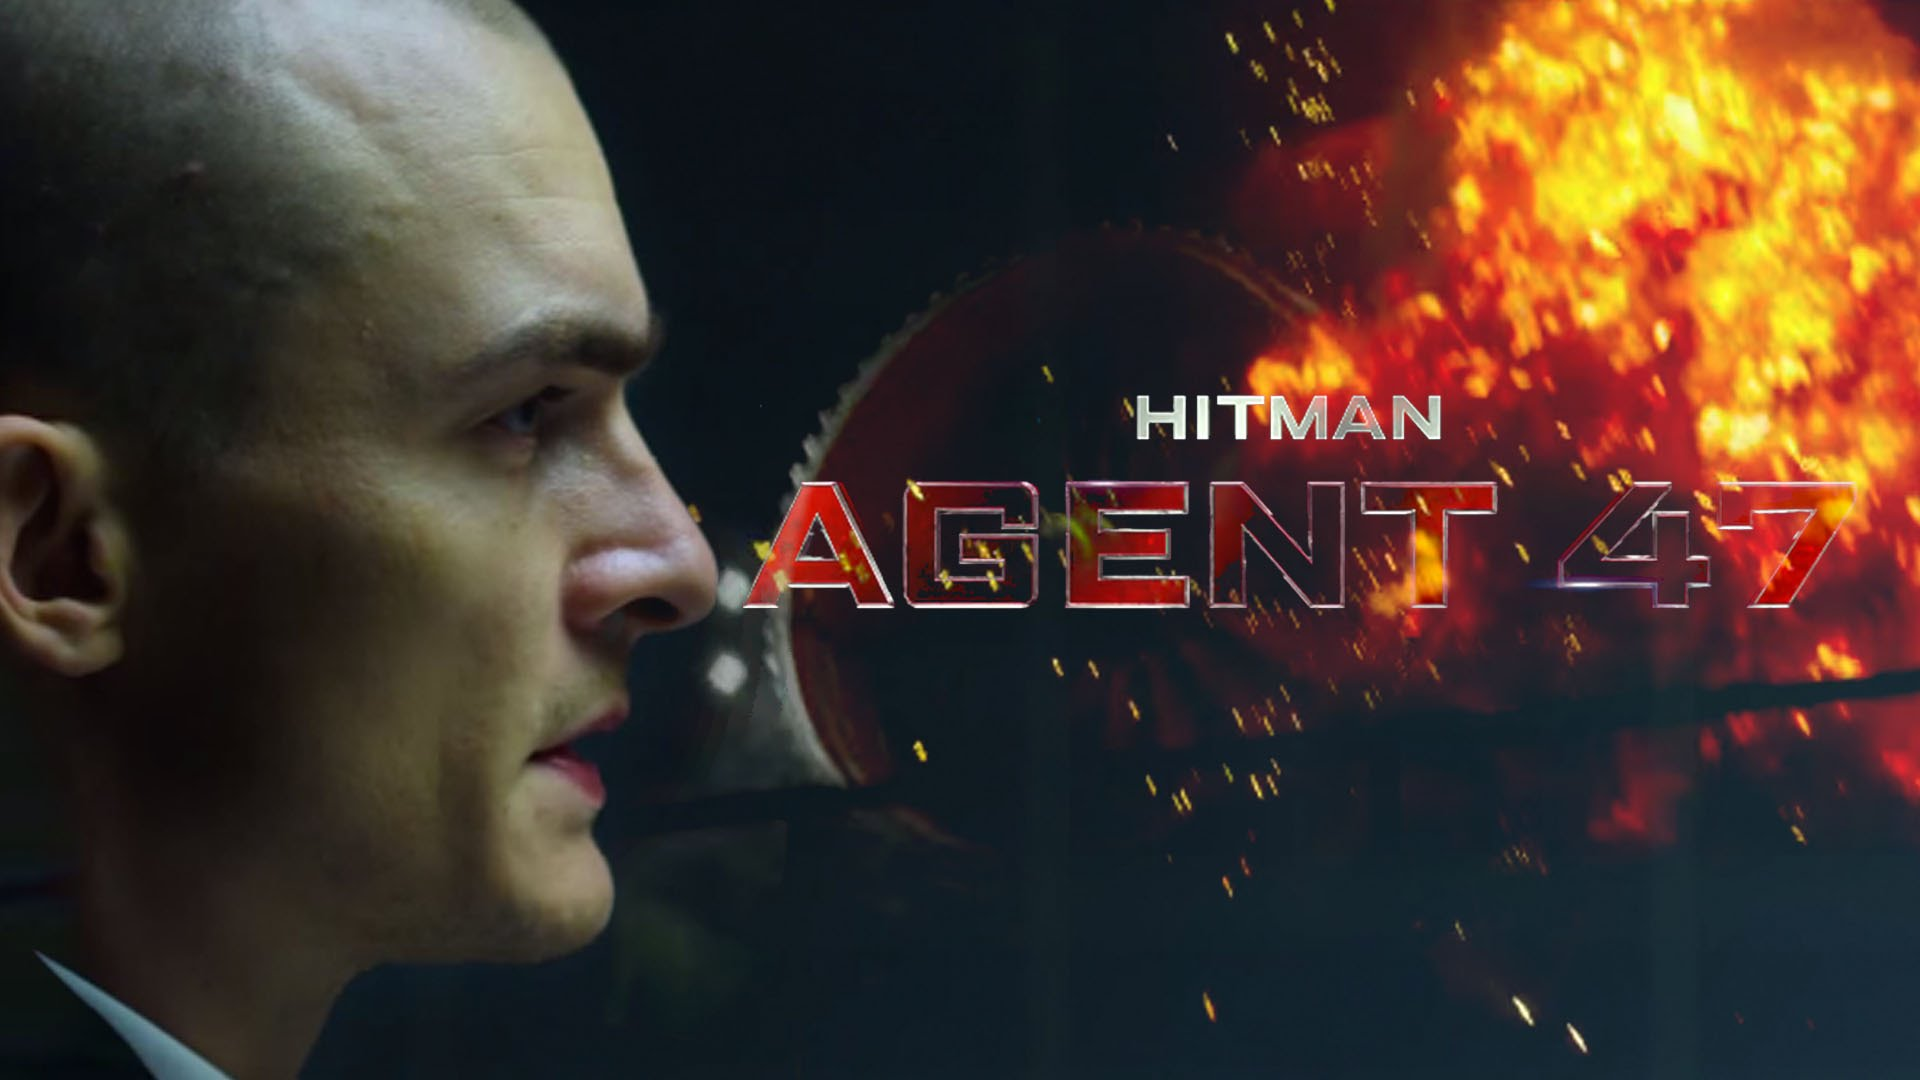 Hitman agent 47 wallpapers high quality download free - Hitman 47 wallpaper ...